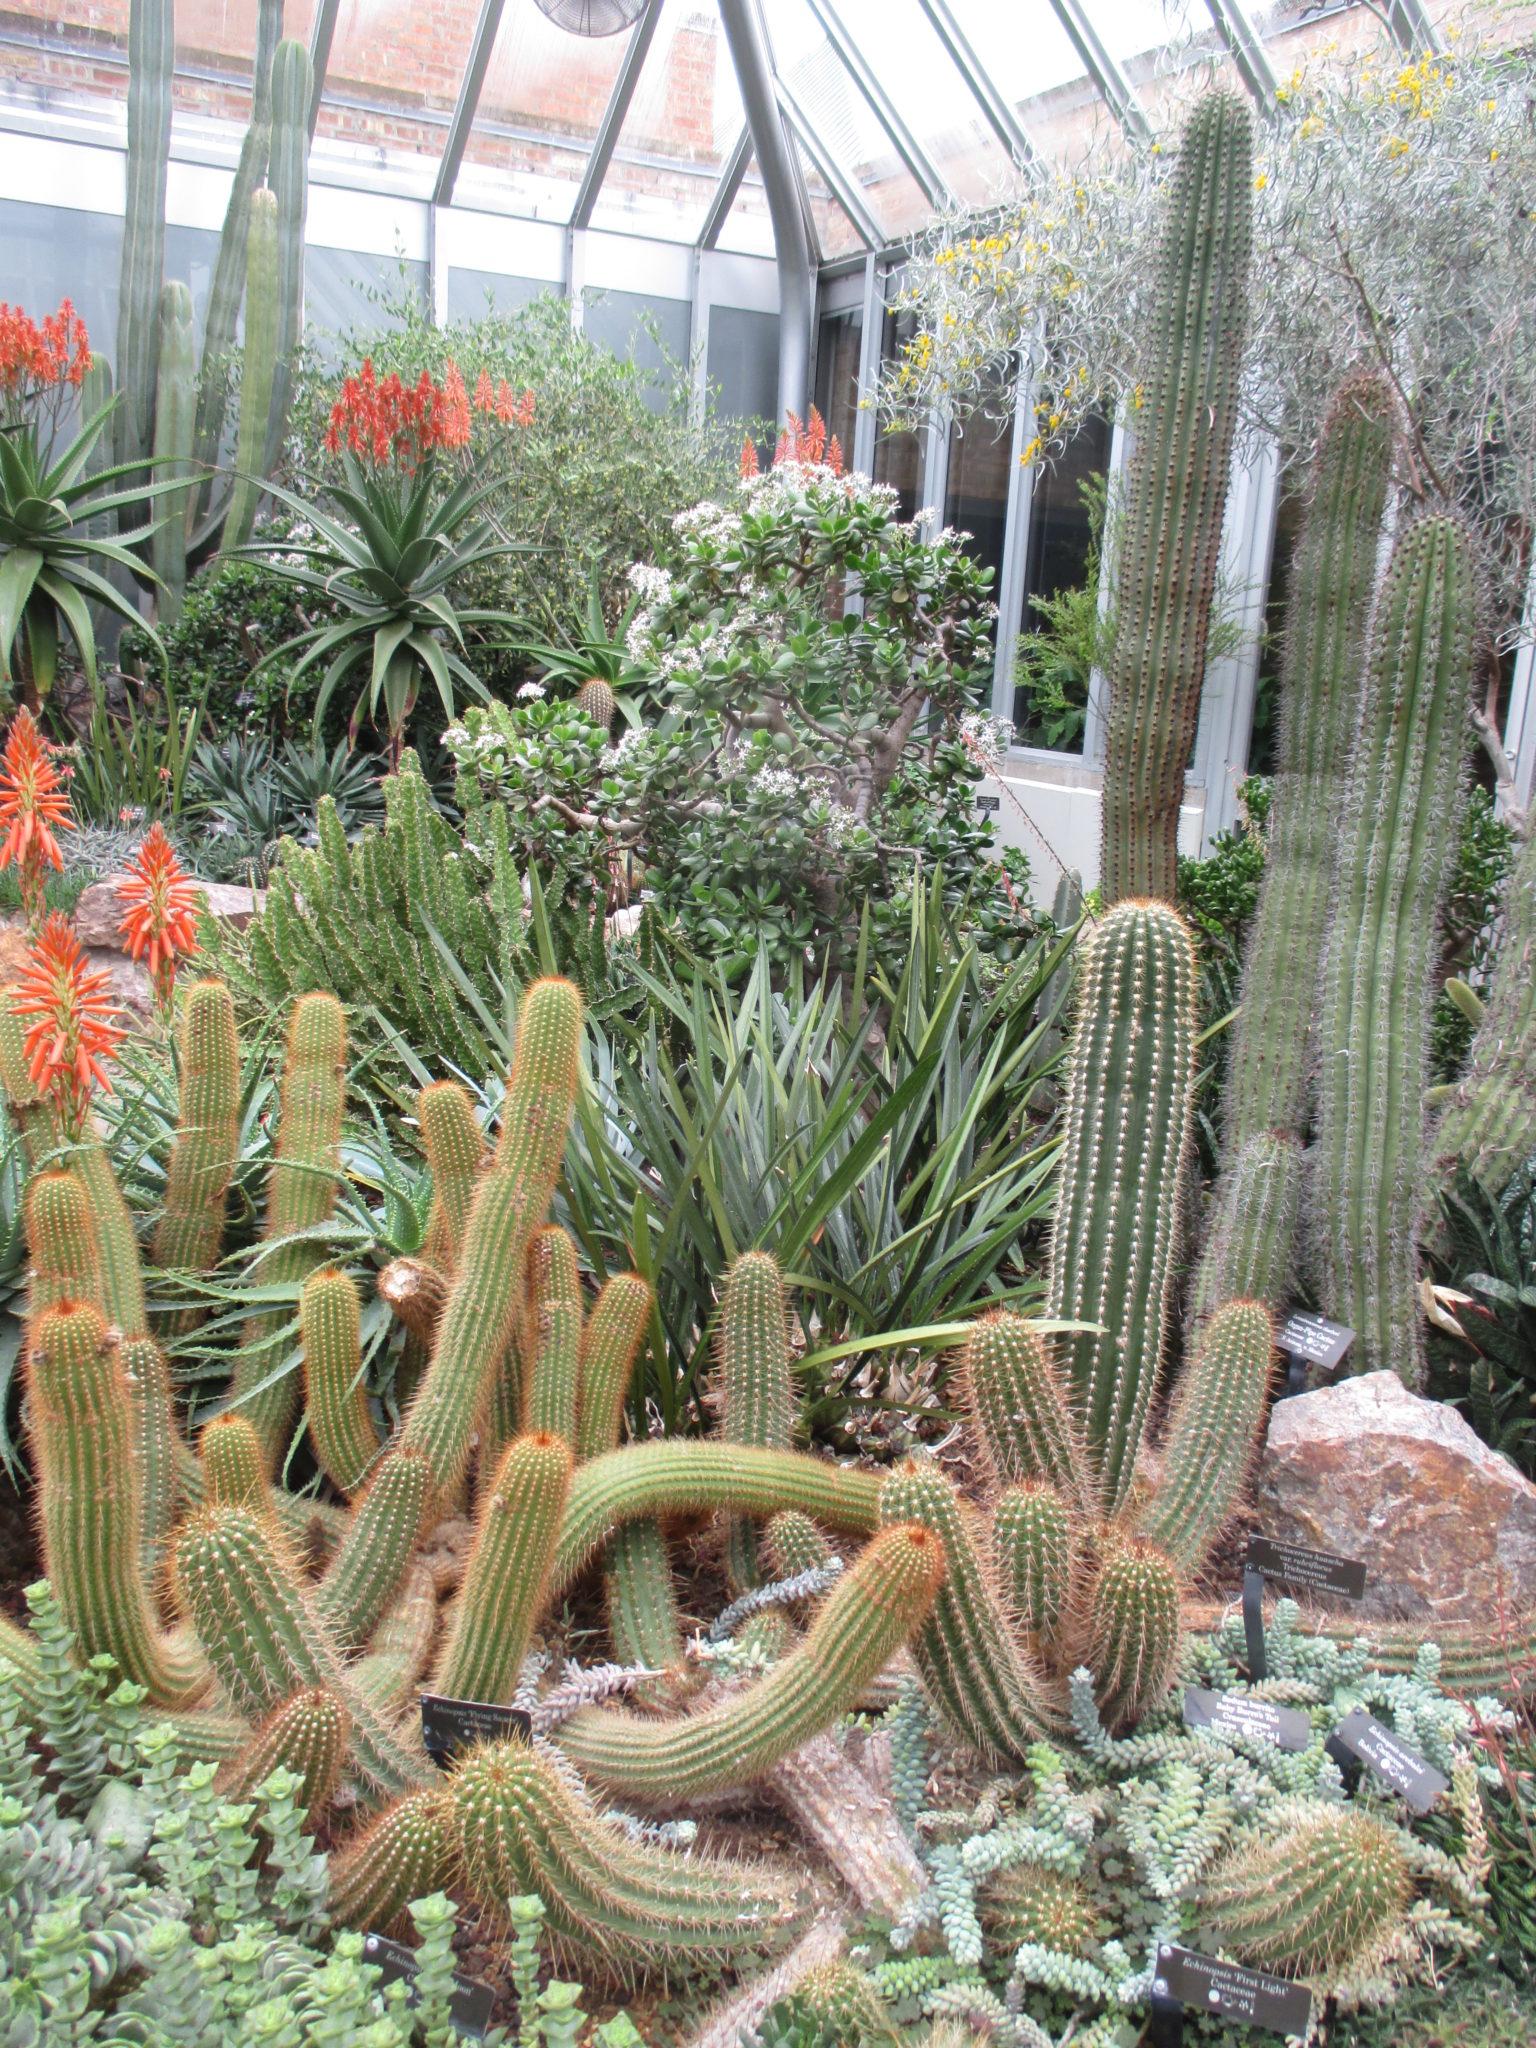 Chicago botanic garden rotary botanical gardens for Chicago botanic garden membership